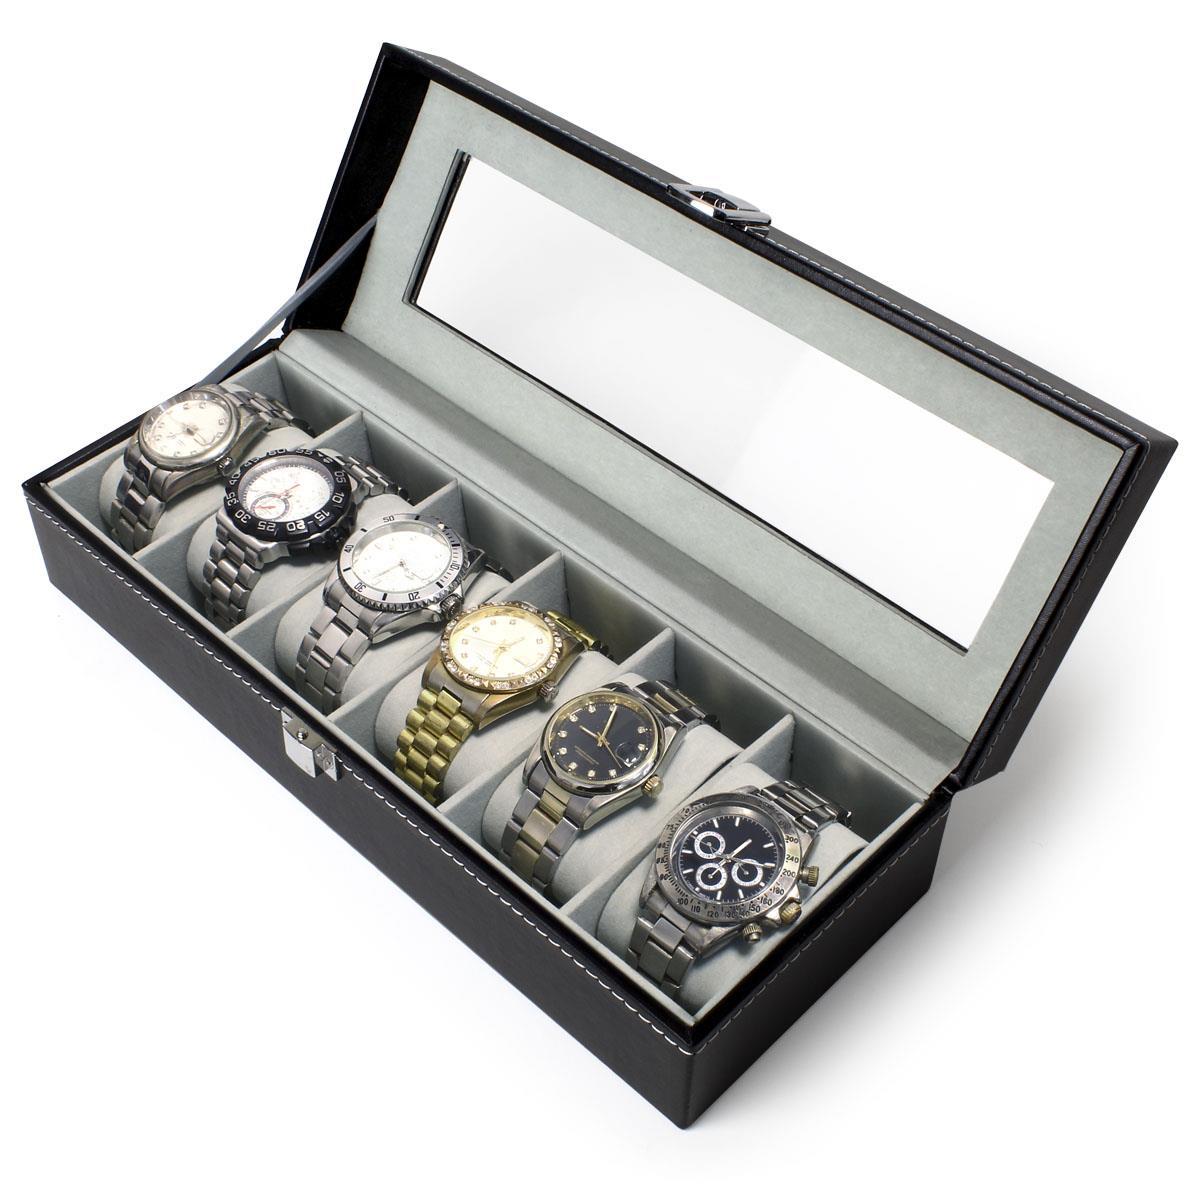 6-12-Watch-Case-Display-Box-Storage-Travel-Men-Women-Ladies-Gents-Jewellery thumbnail 4